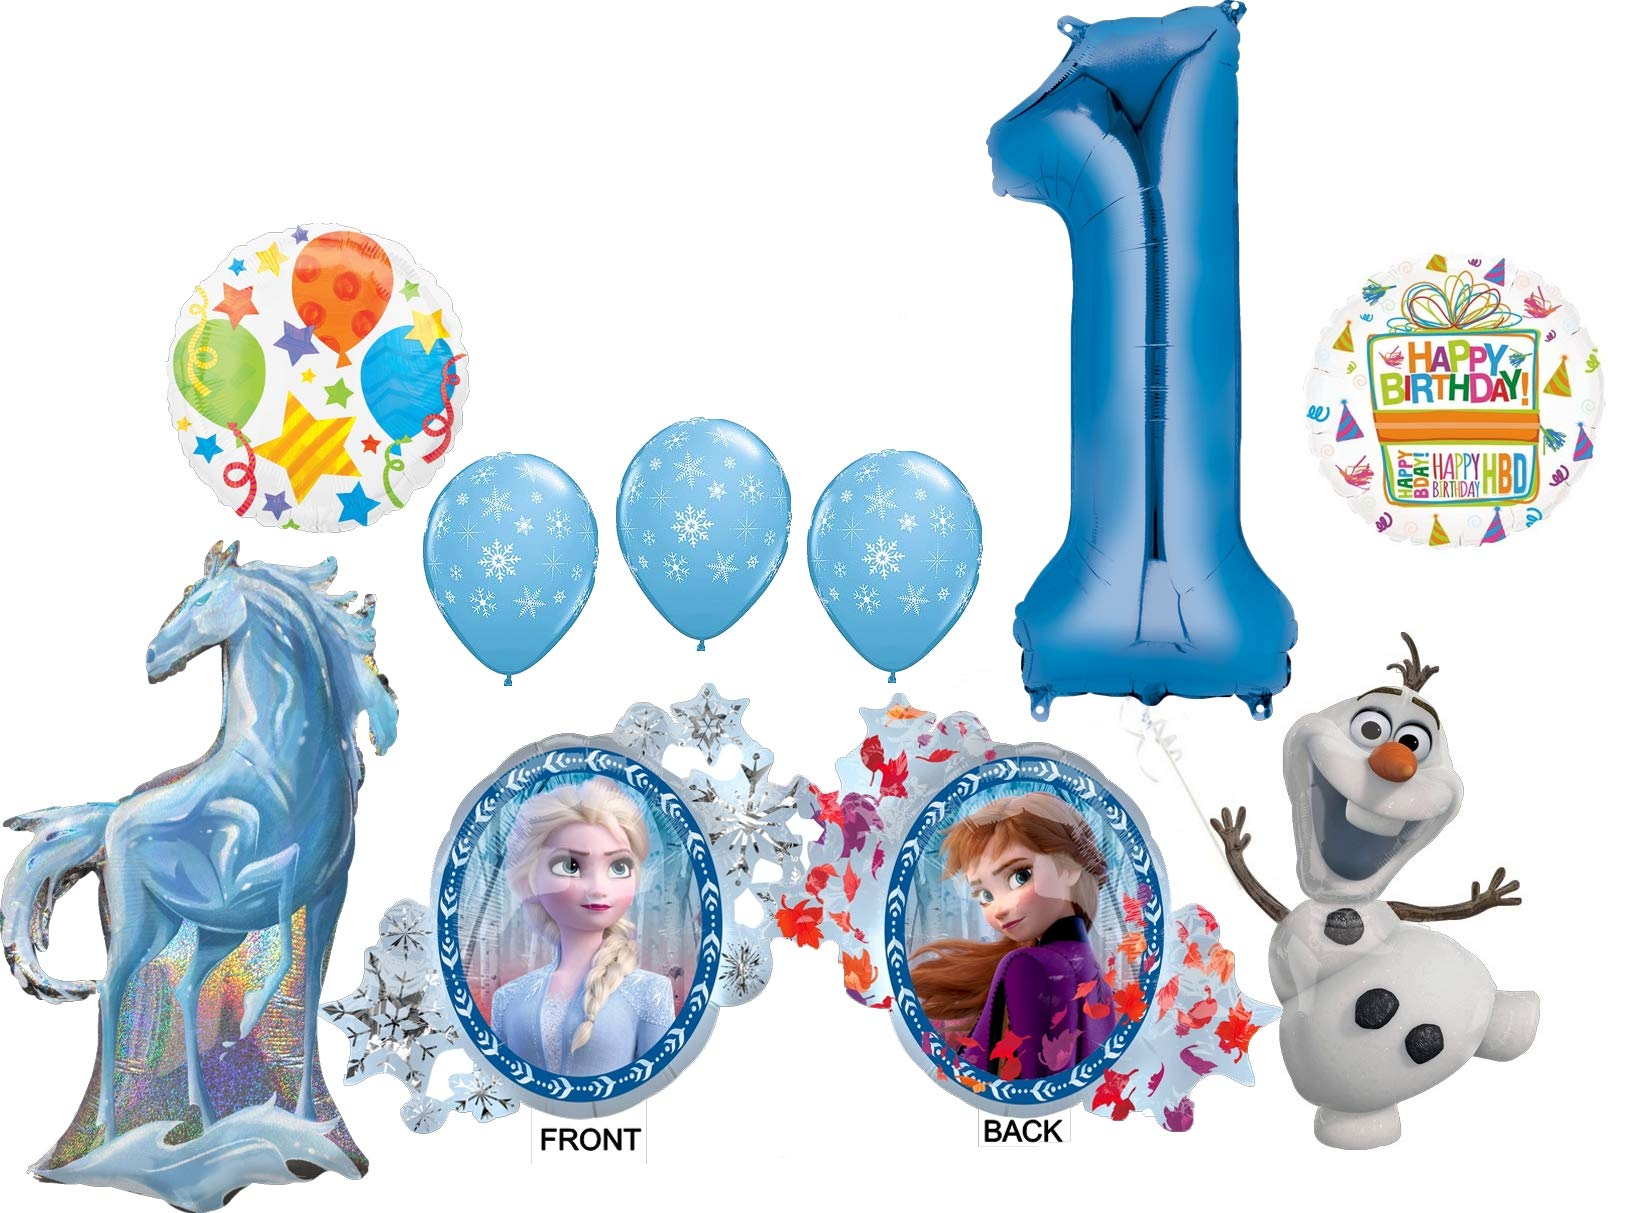 Frozen 2 Party Supplies 1st Birthday Elsa Anna Olaf And Nokk Balloon Bouquet Decorations Walmart Com Walmart Com